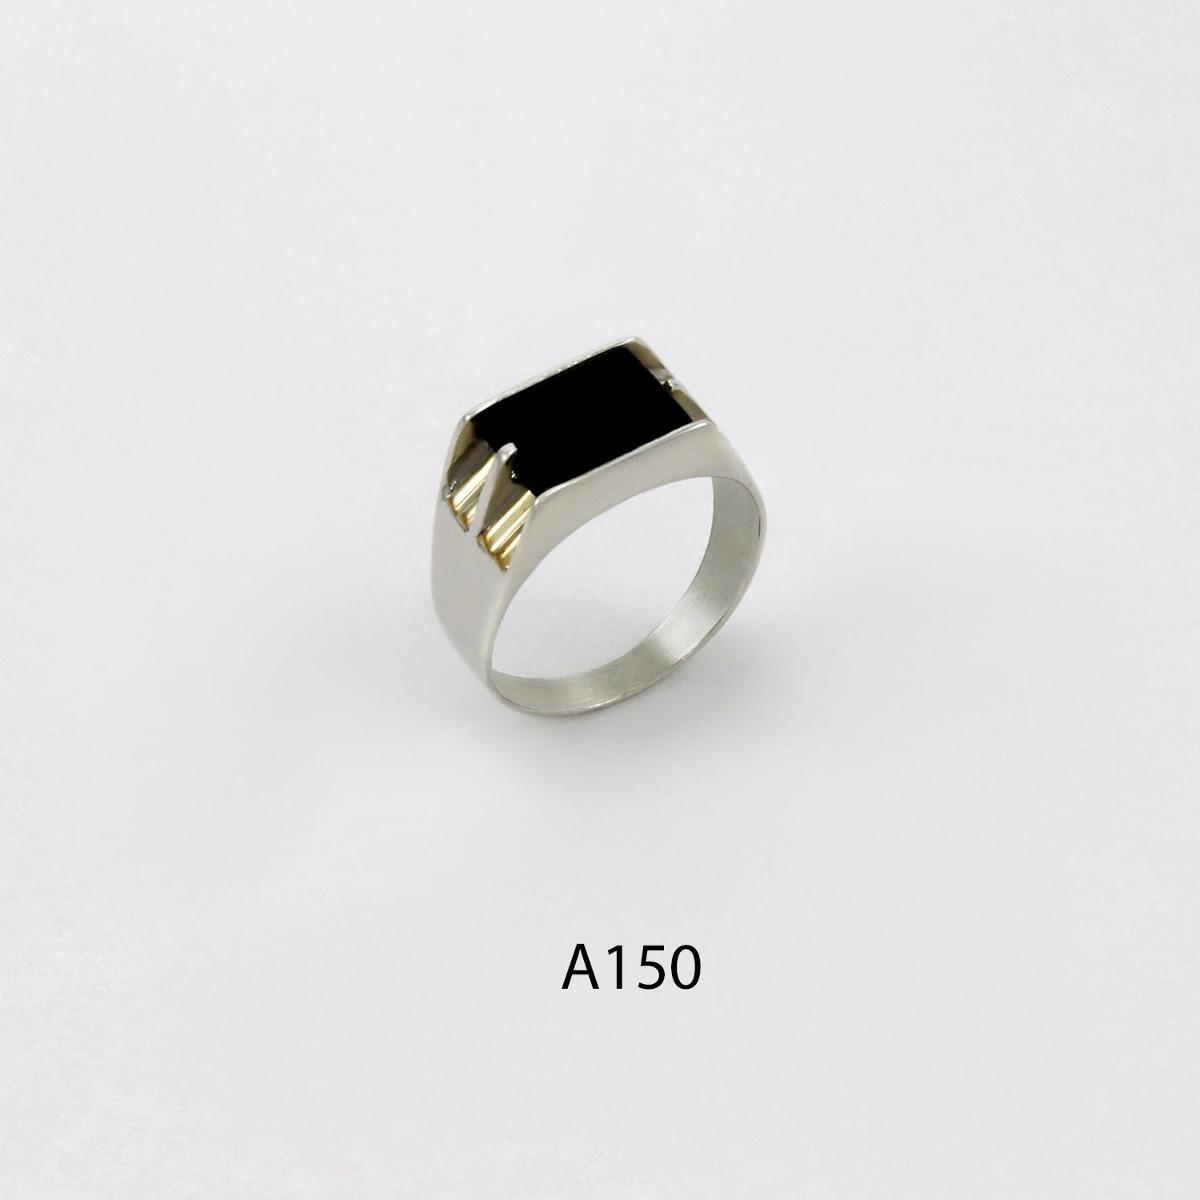 c702bdc6e287 anillo de plata 925 y oro codigo a150 piedra negra. Cargando zoom.